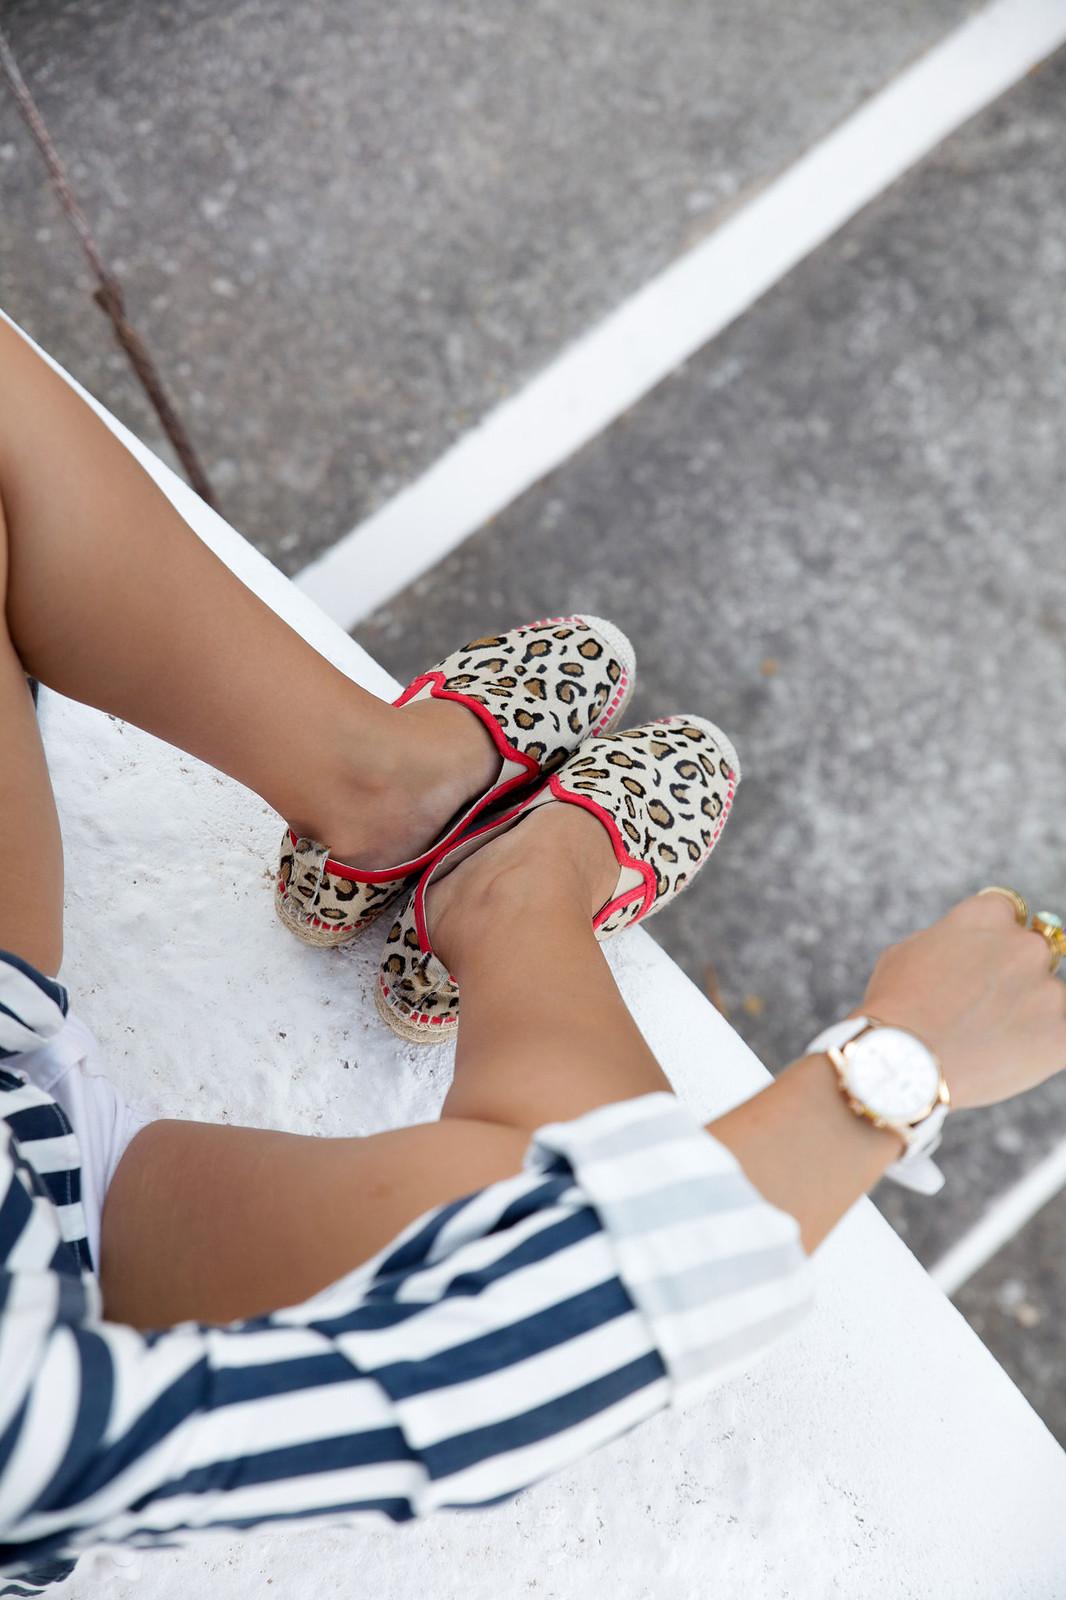 011_Leopard_and_stripes_perfec_mix_print_outfit_THEGUESTGIRL_best_details_shoes_leopard_inspo